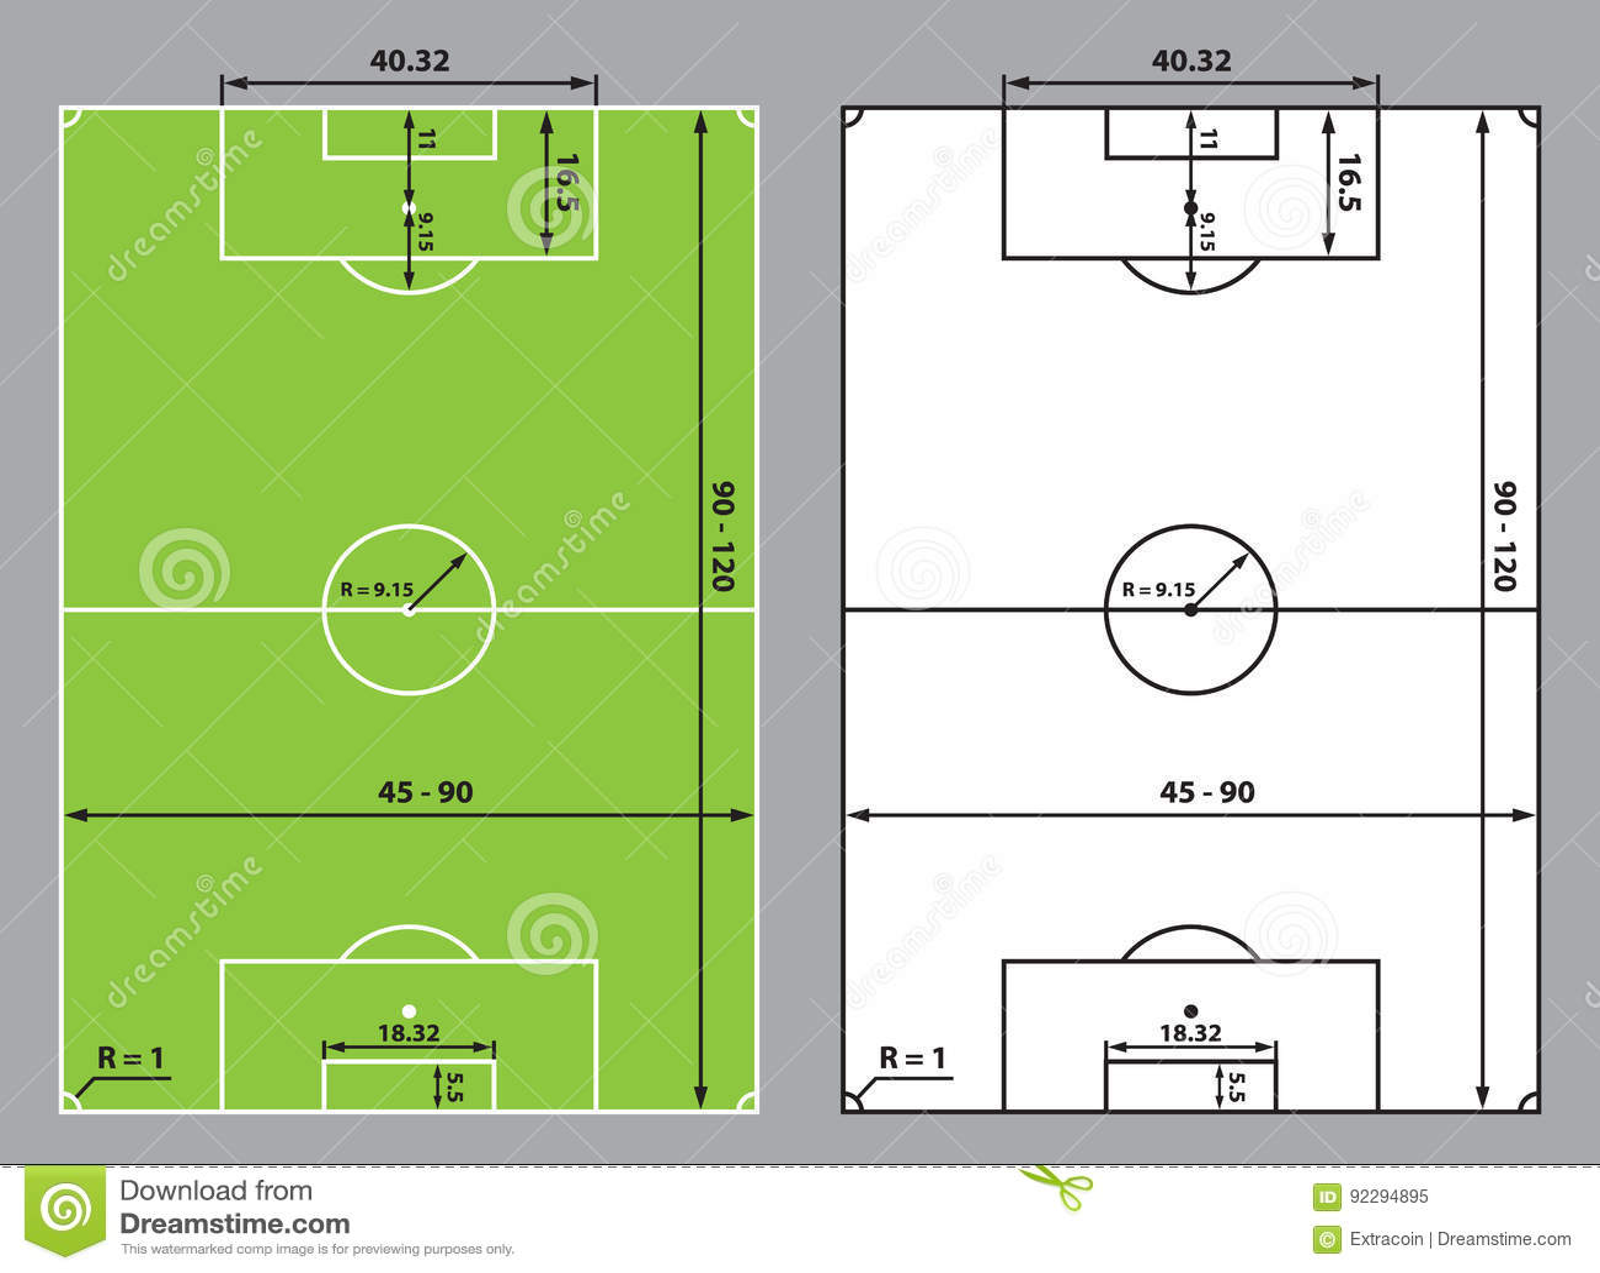 diagram of football ground with measurements molex to sata wiring field scheme cartoon vector cartoondealer